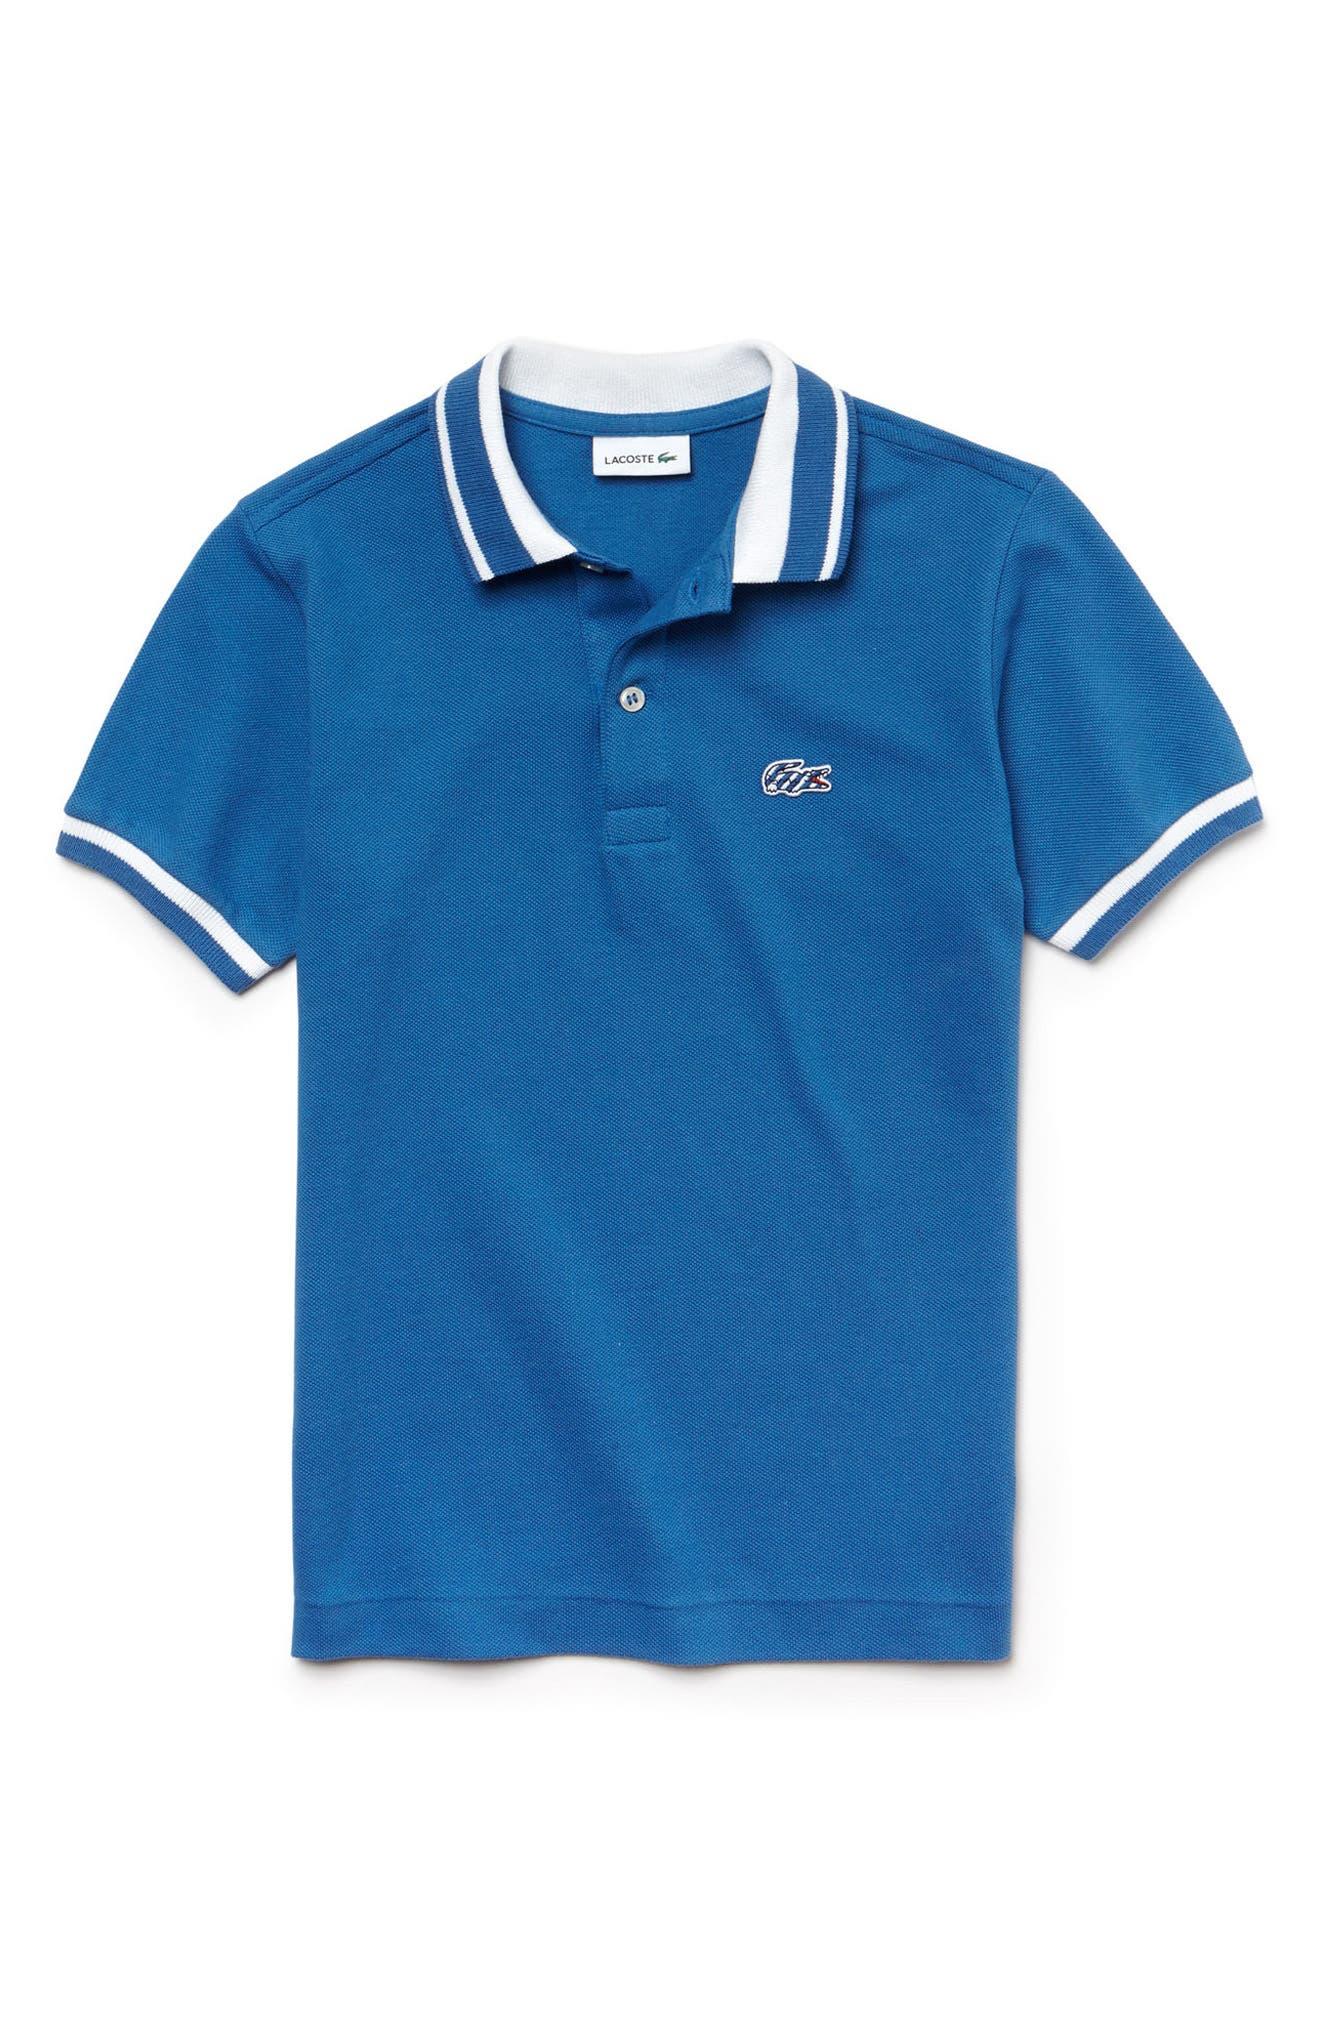 Piqué Polo,                         Main,                         color, Elysee Blue/ White